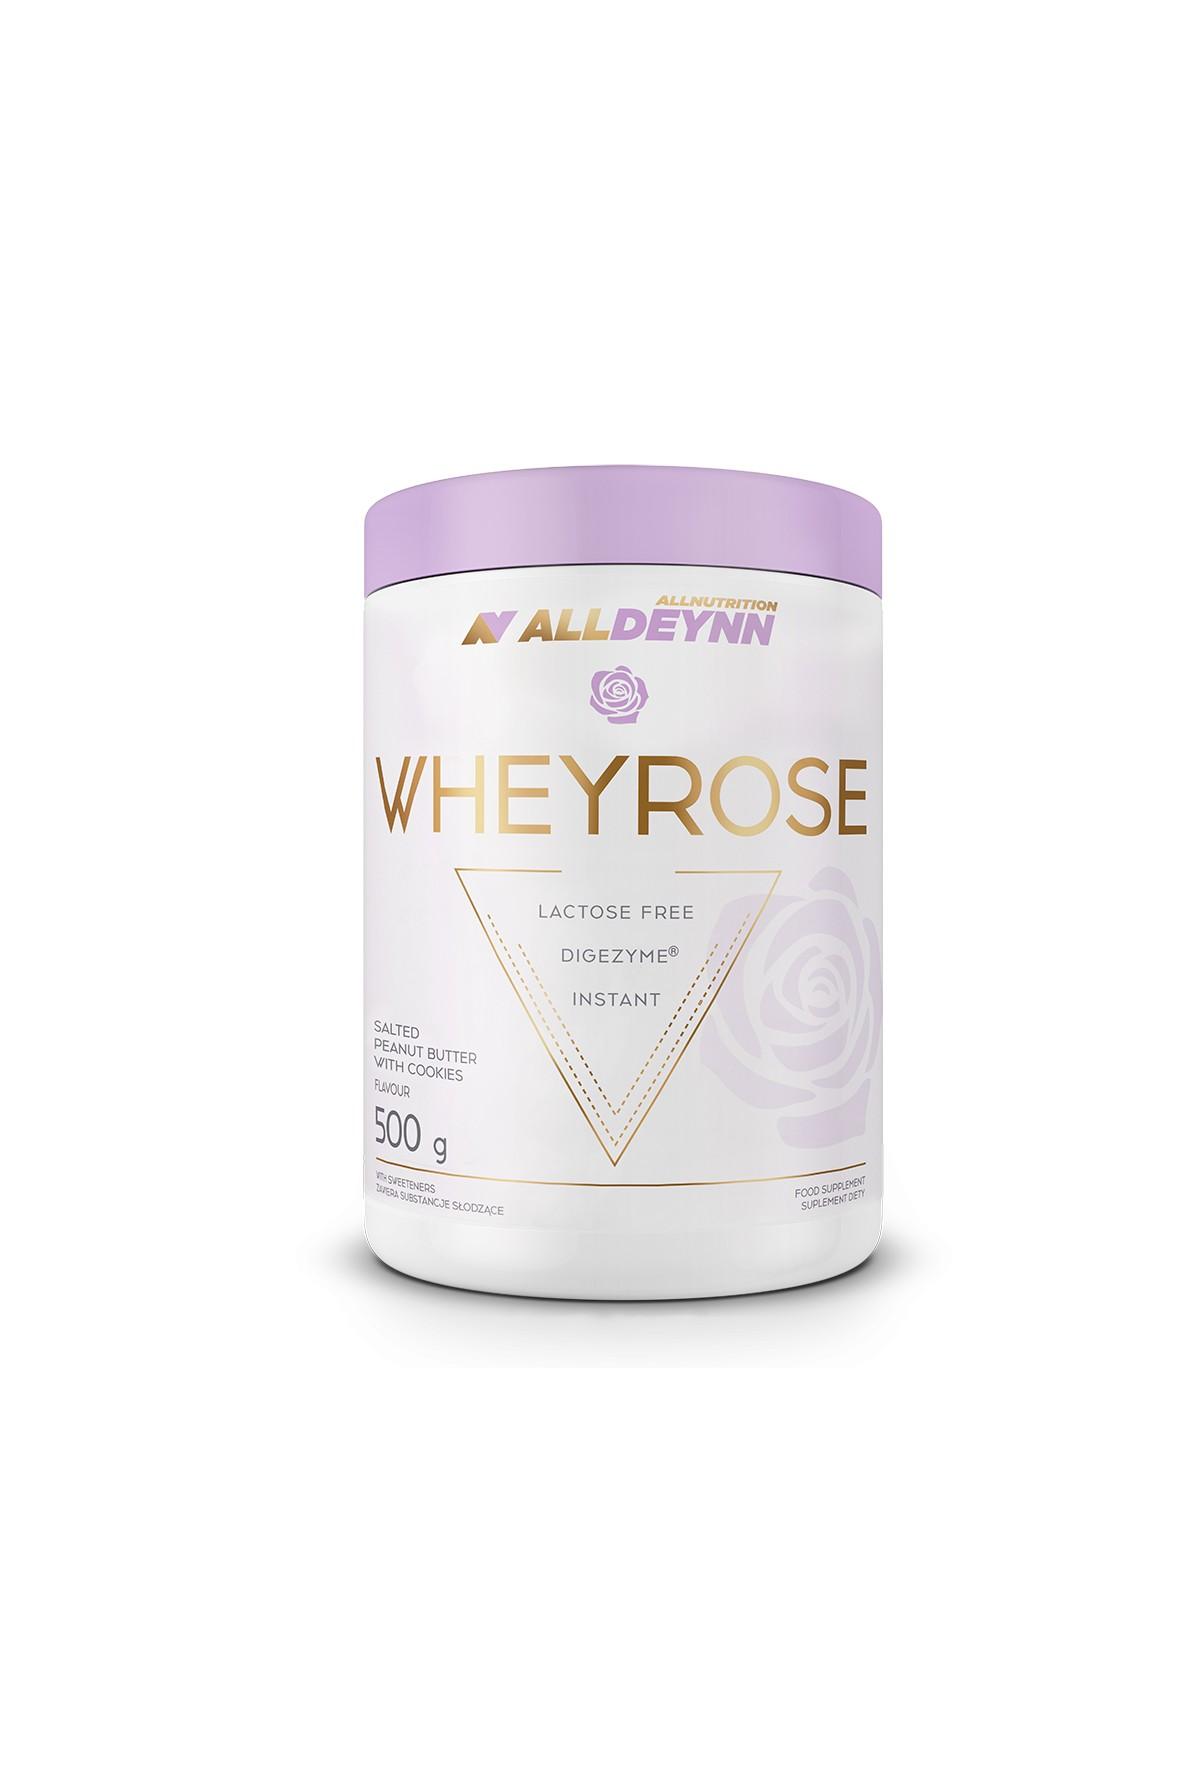 Suplementy diety - Allnutrition ALLDEYNN Wheyrose 500 g Salted Peanut Butter With Cookie